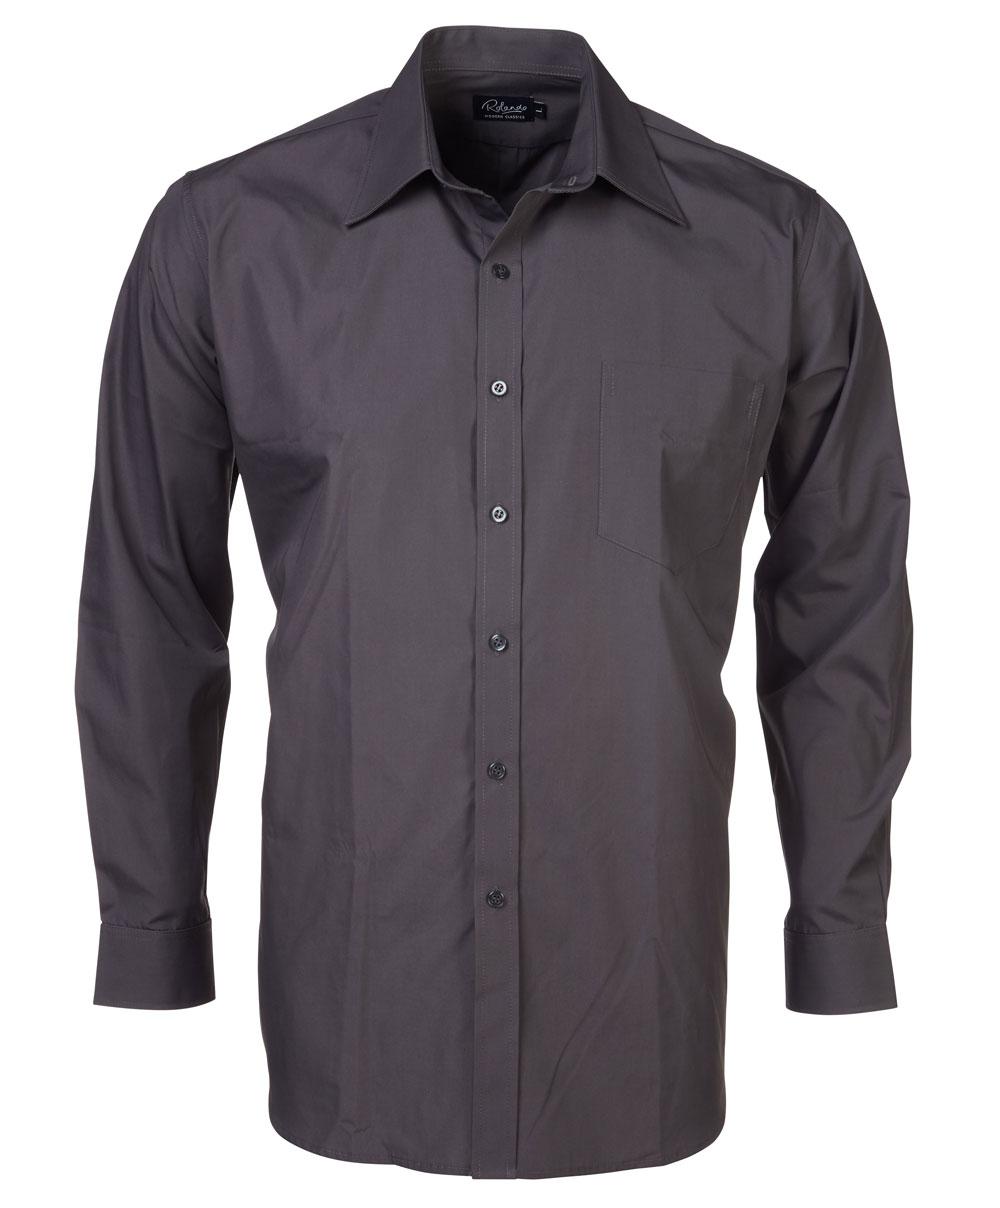 Mens P070 S/s Shirt - Charcoal